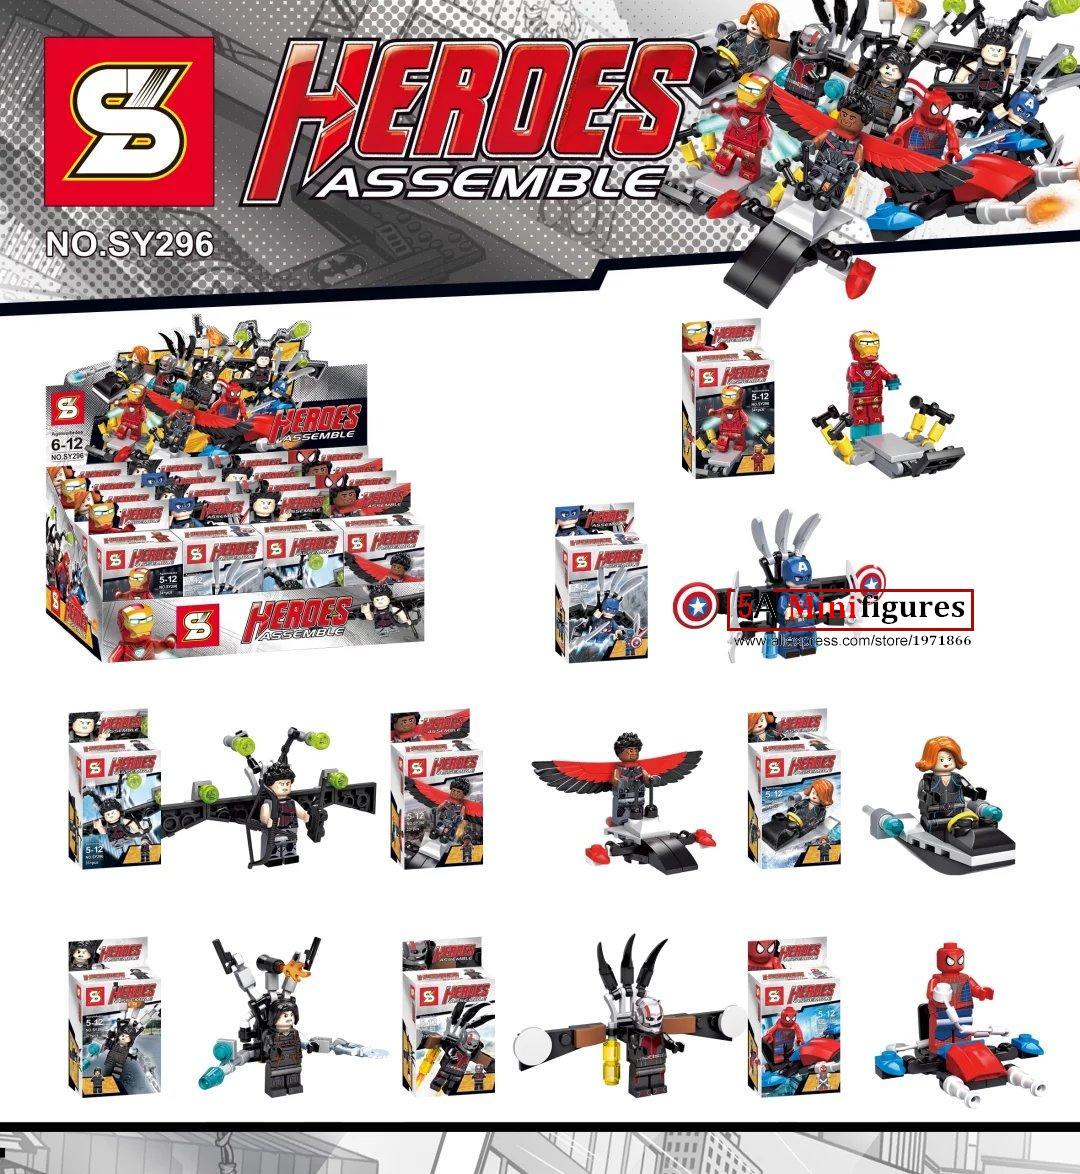 Lego Spiderman Malvorlagen Star Wars 1 Lego Spiderman: Lego Spiderman Promotion-Shop For Promotional Lego